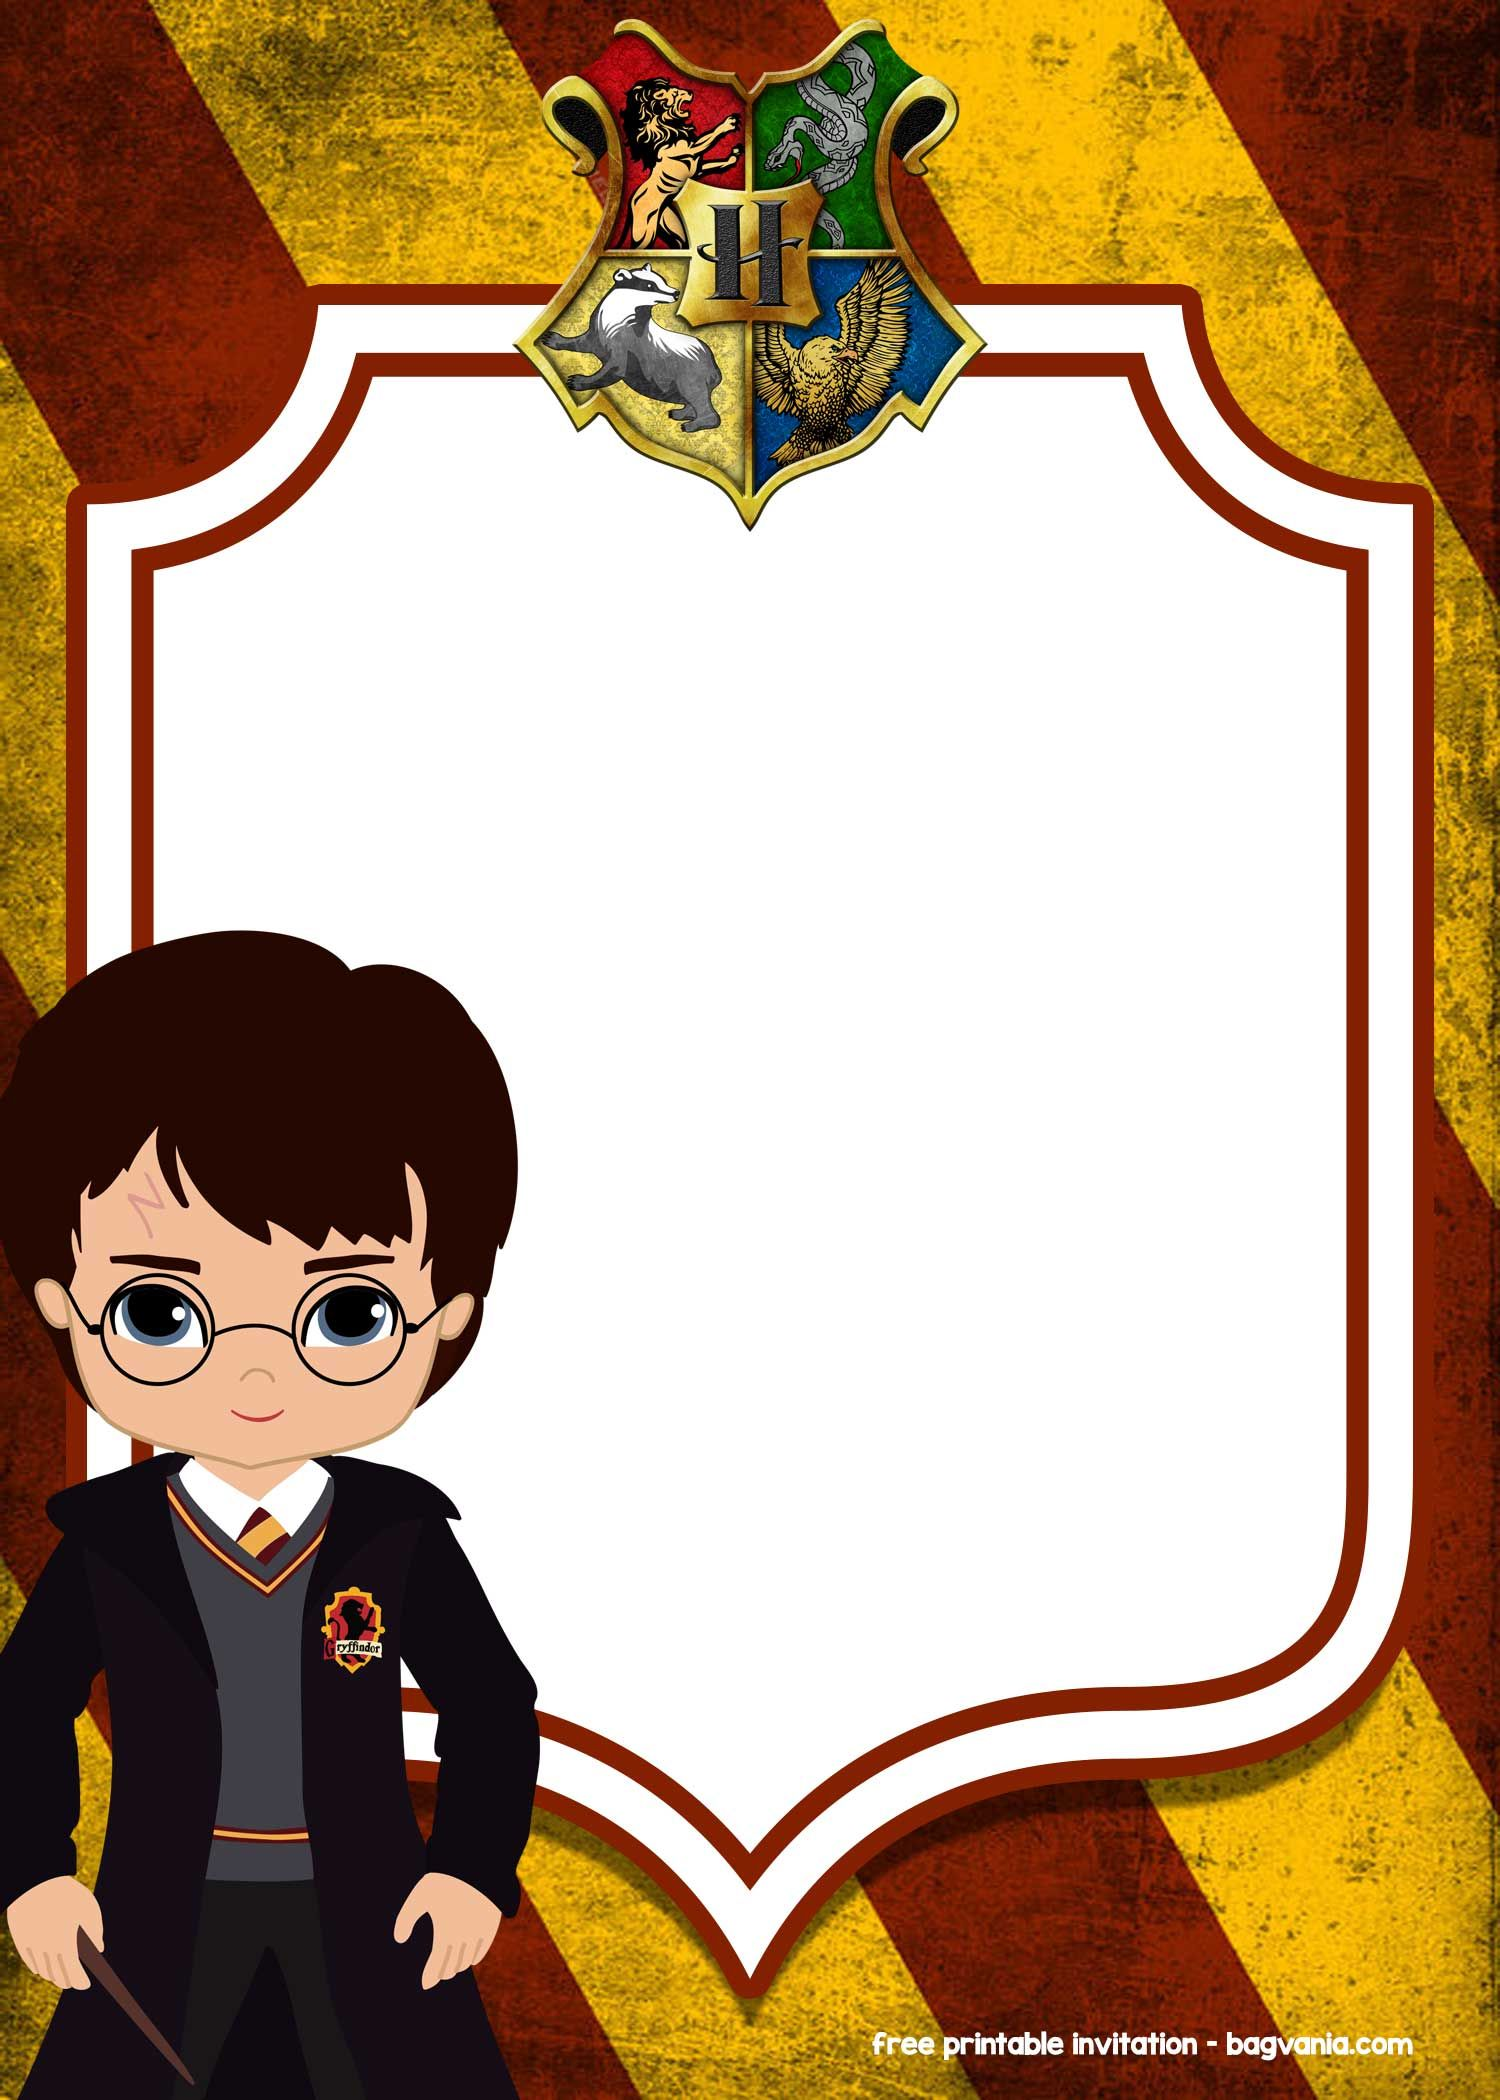 Free Printable Harry Potter Invitation Templates Drevio Invitations D Harry Potter Invitations Harry Potter Printables Free Harry Potter Birthday Invitations